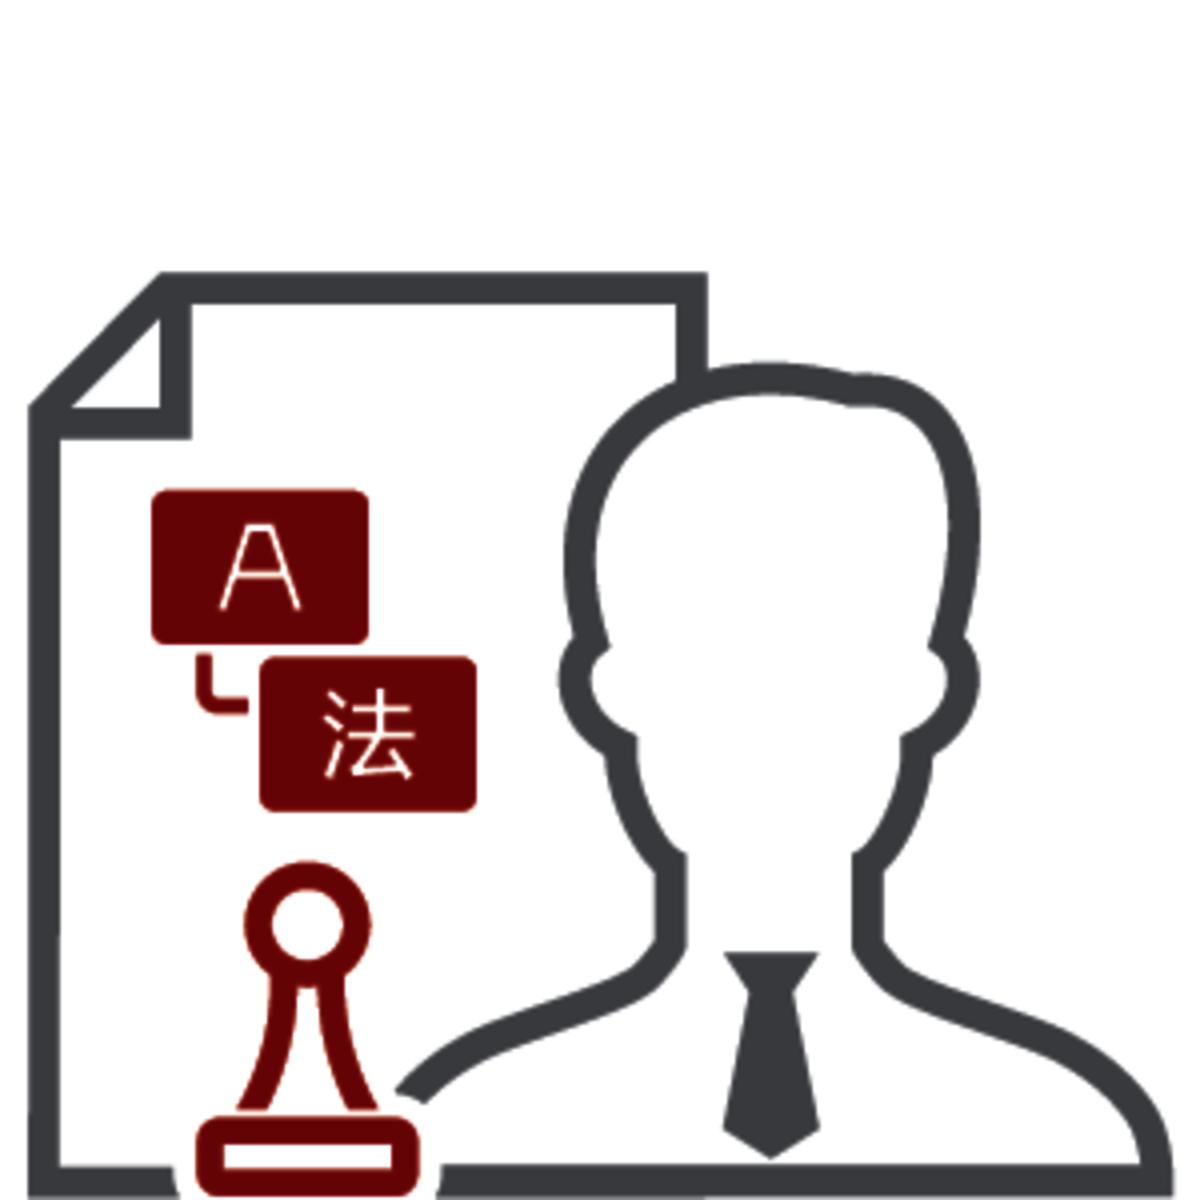 LT Lawtank - Certified translation - Authenticated translation